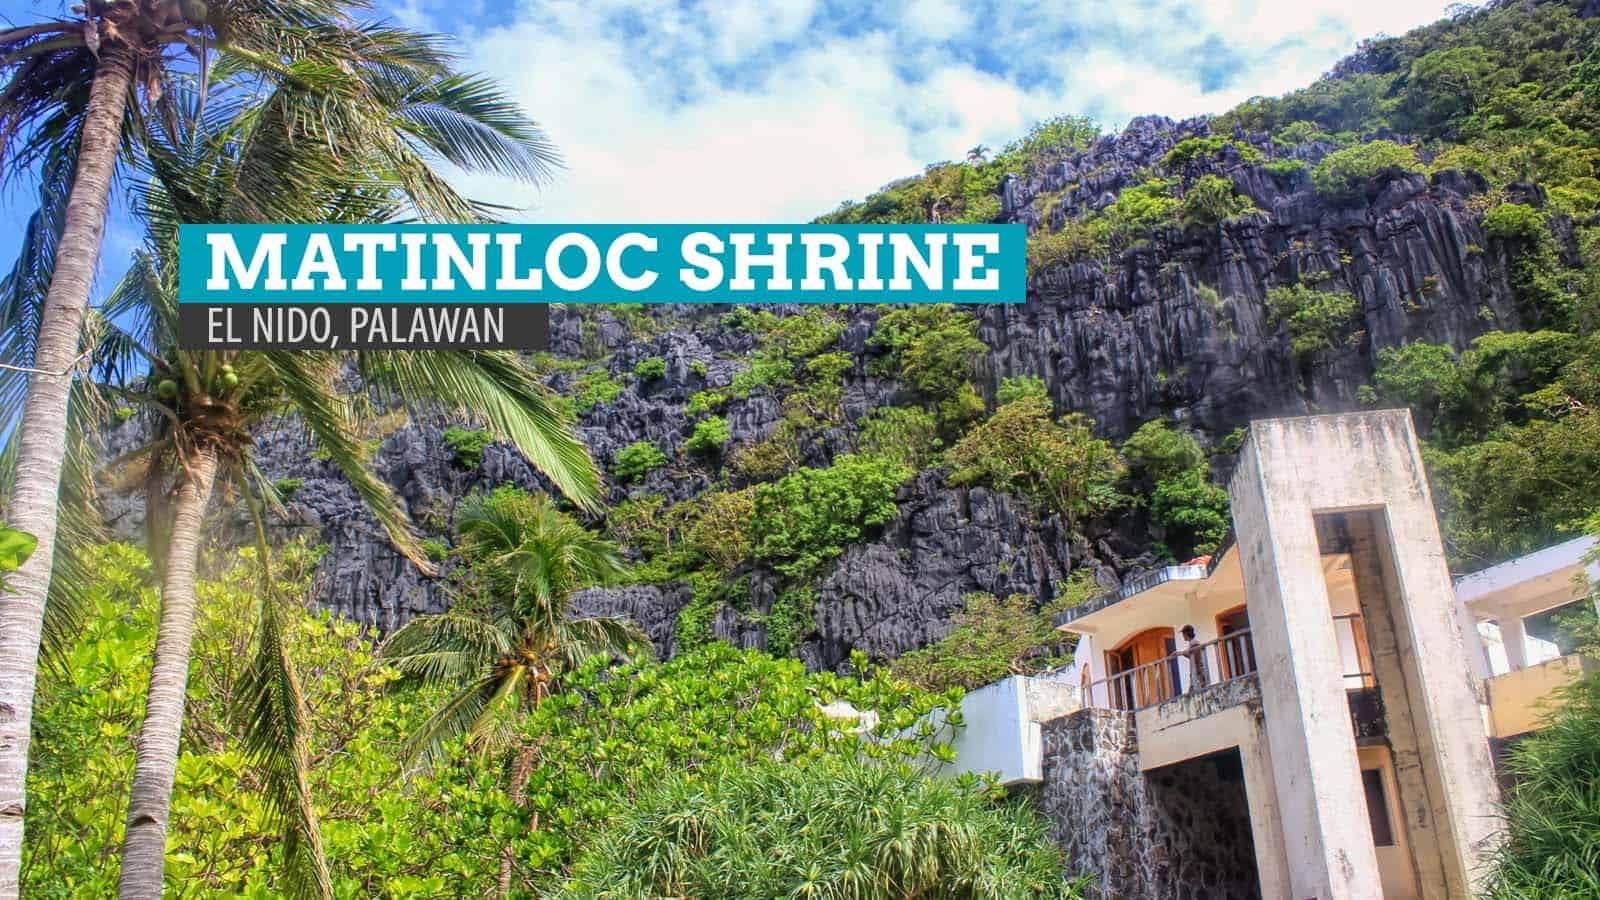 MATINLOC SHRINE: 巴拉望岛艾尔尼多的两面弃儿 | 穷游者行程博客